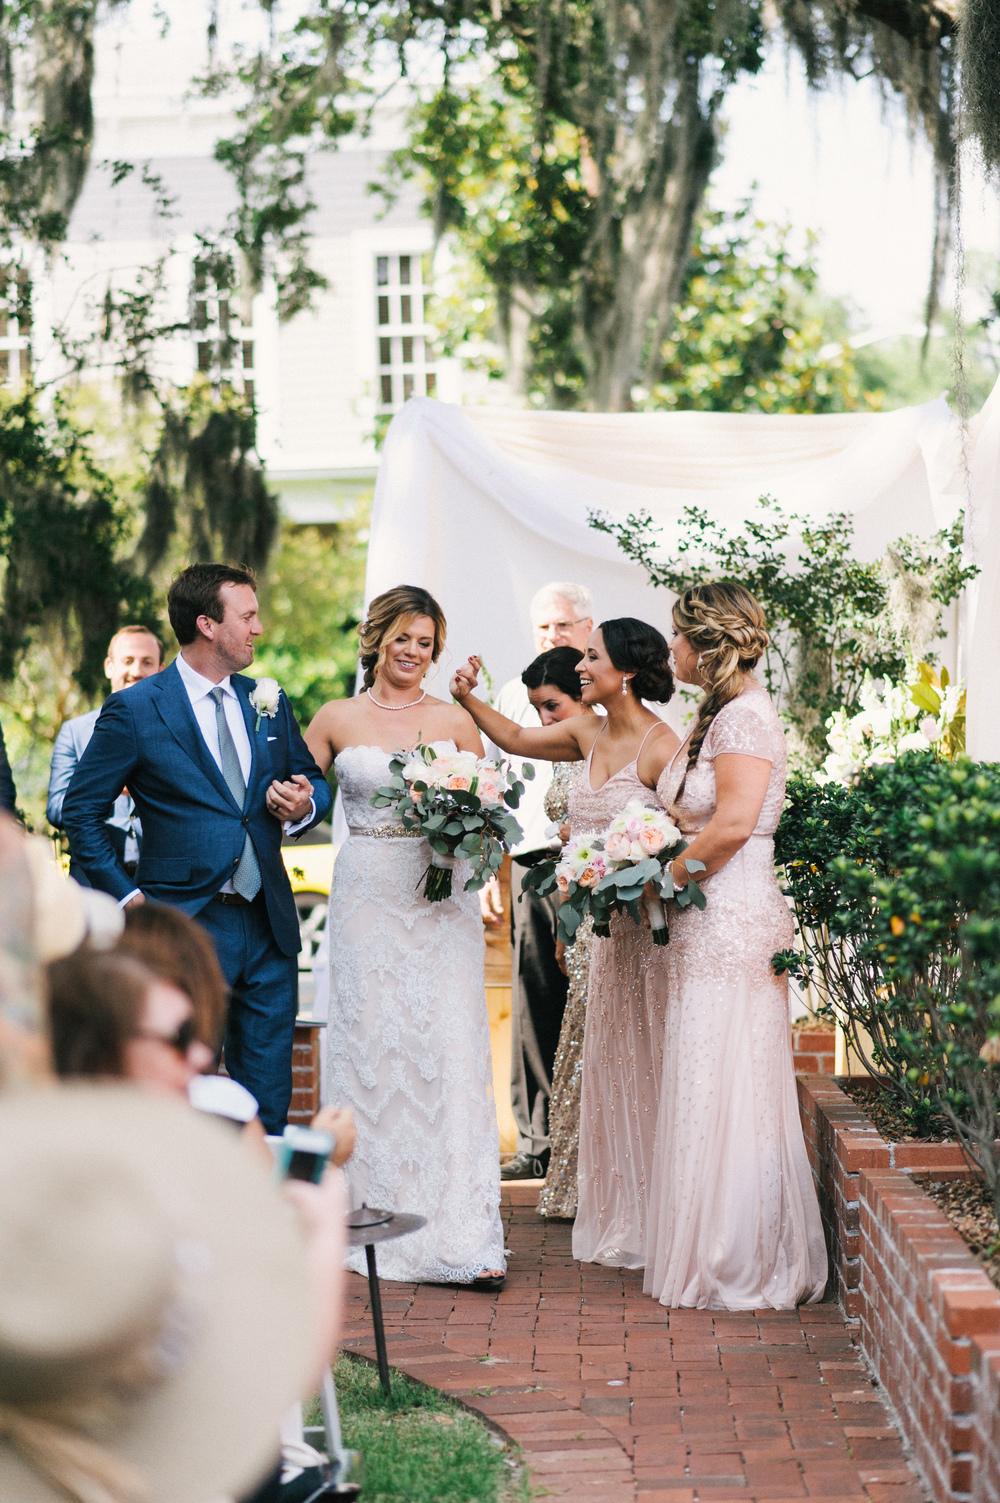 kacey-and-niall-June-4-savanna-georgia-wedding-m-newsom-photography- (347 of 961).jpg